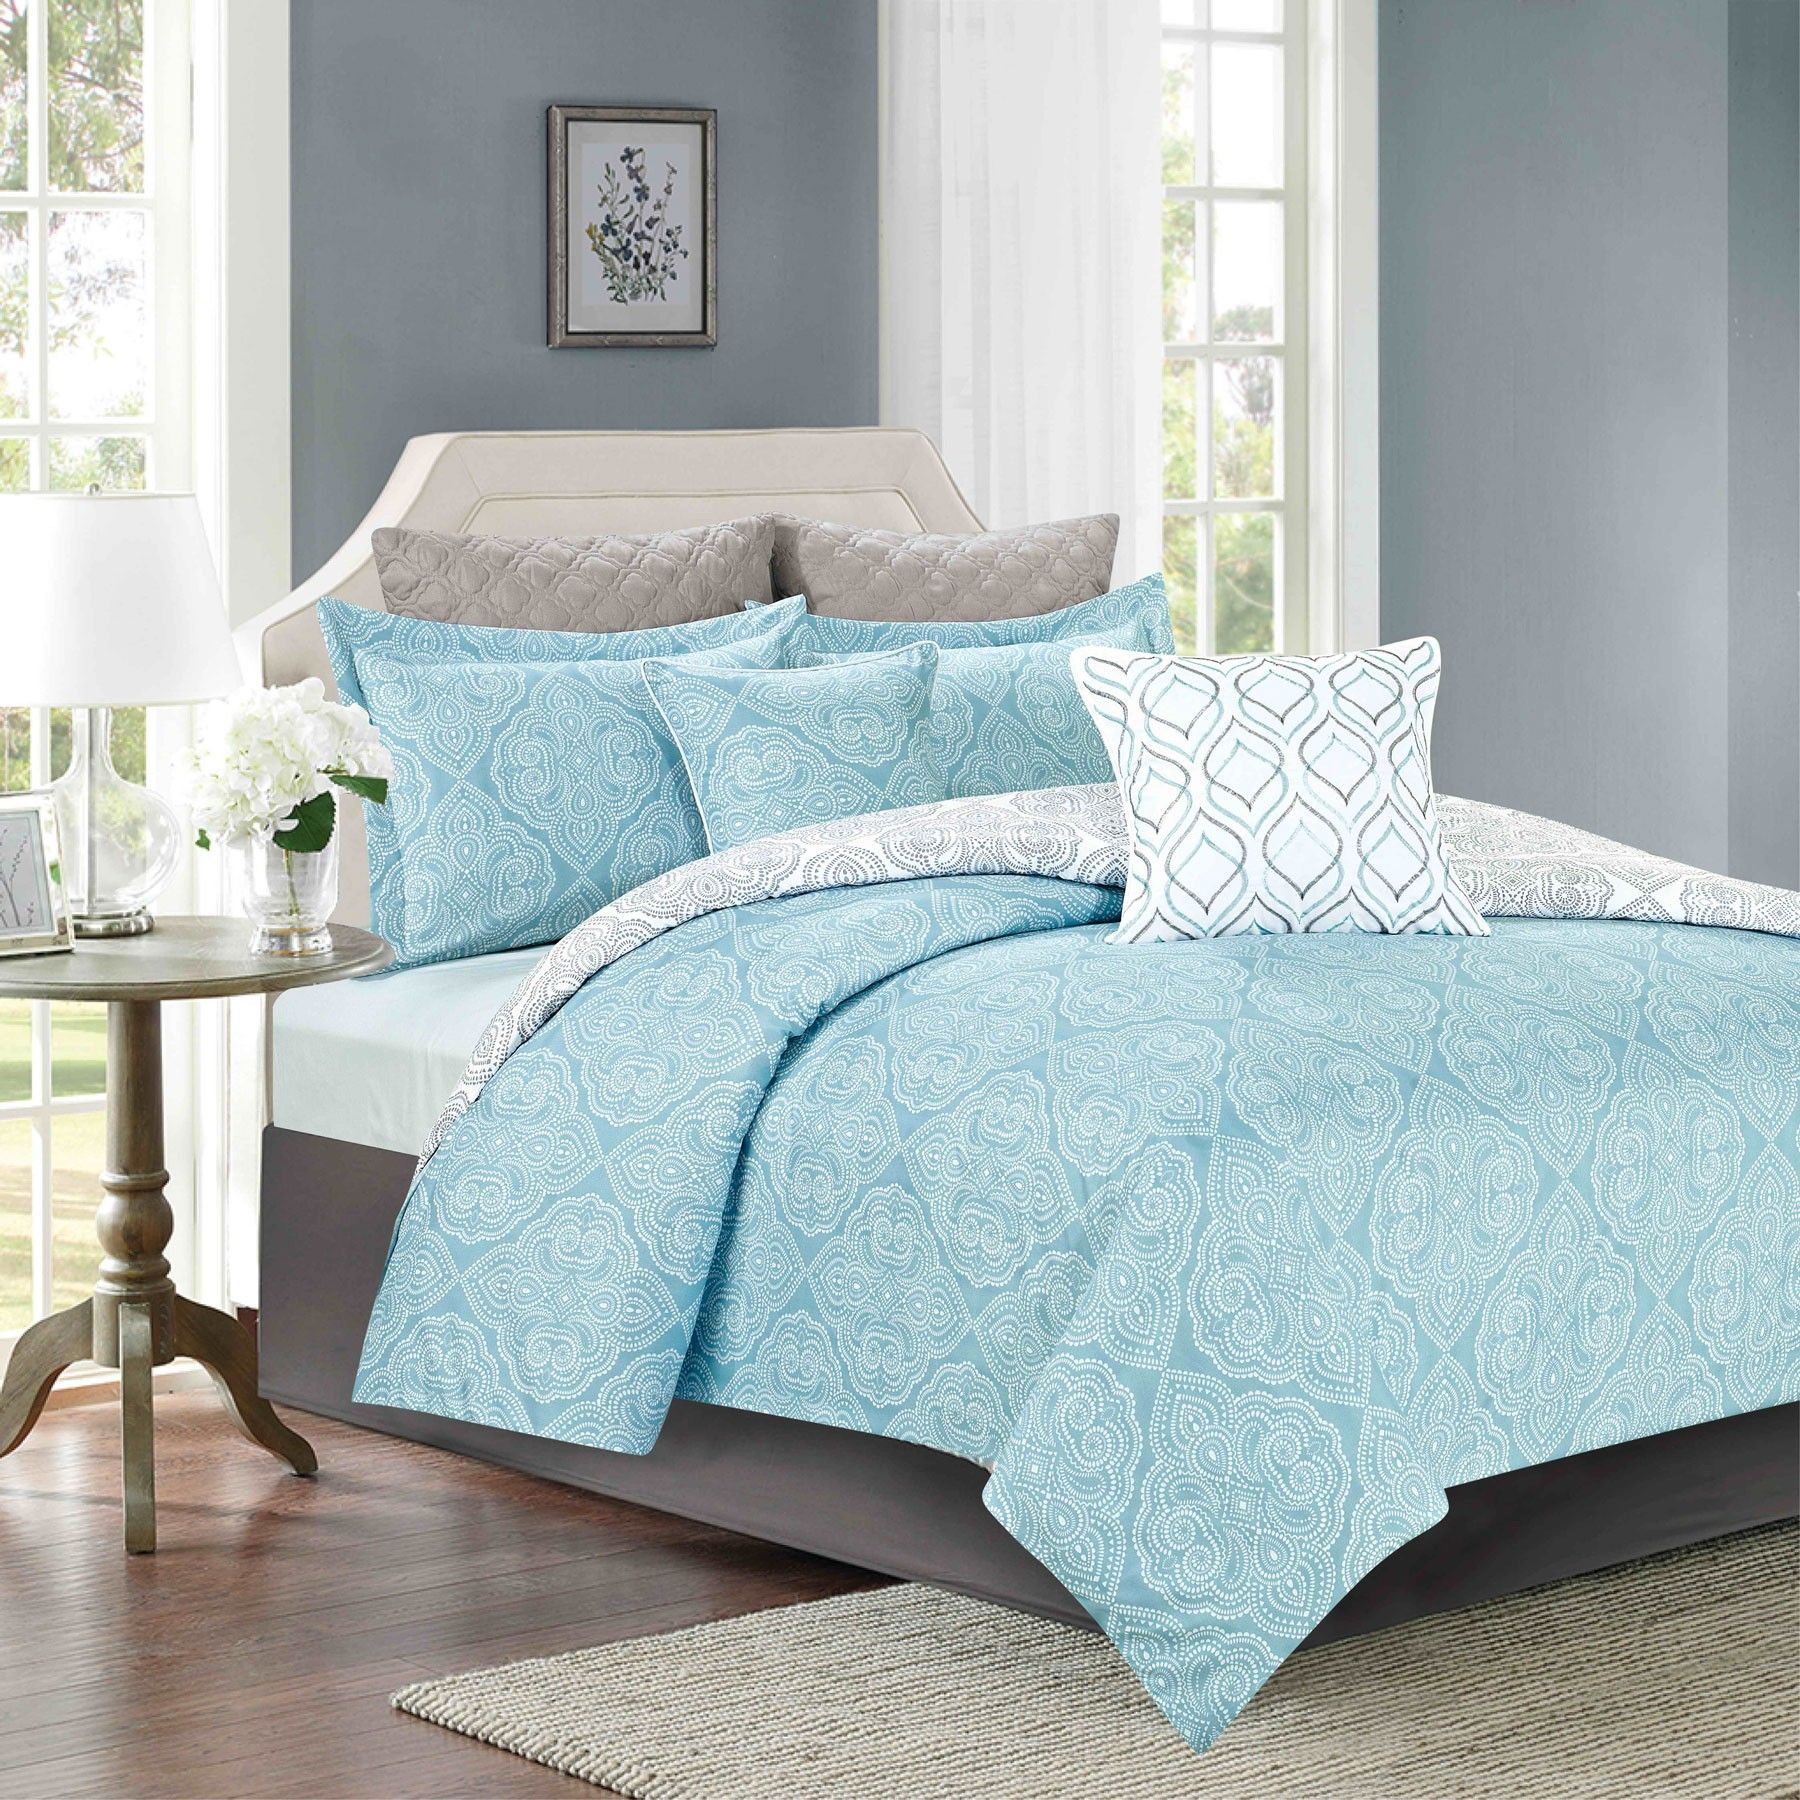 Crest Home Acacia Bedding Comforter 7 Piece Queen Size Bed